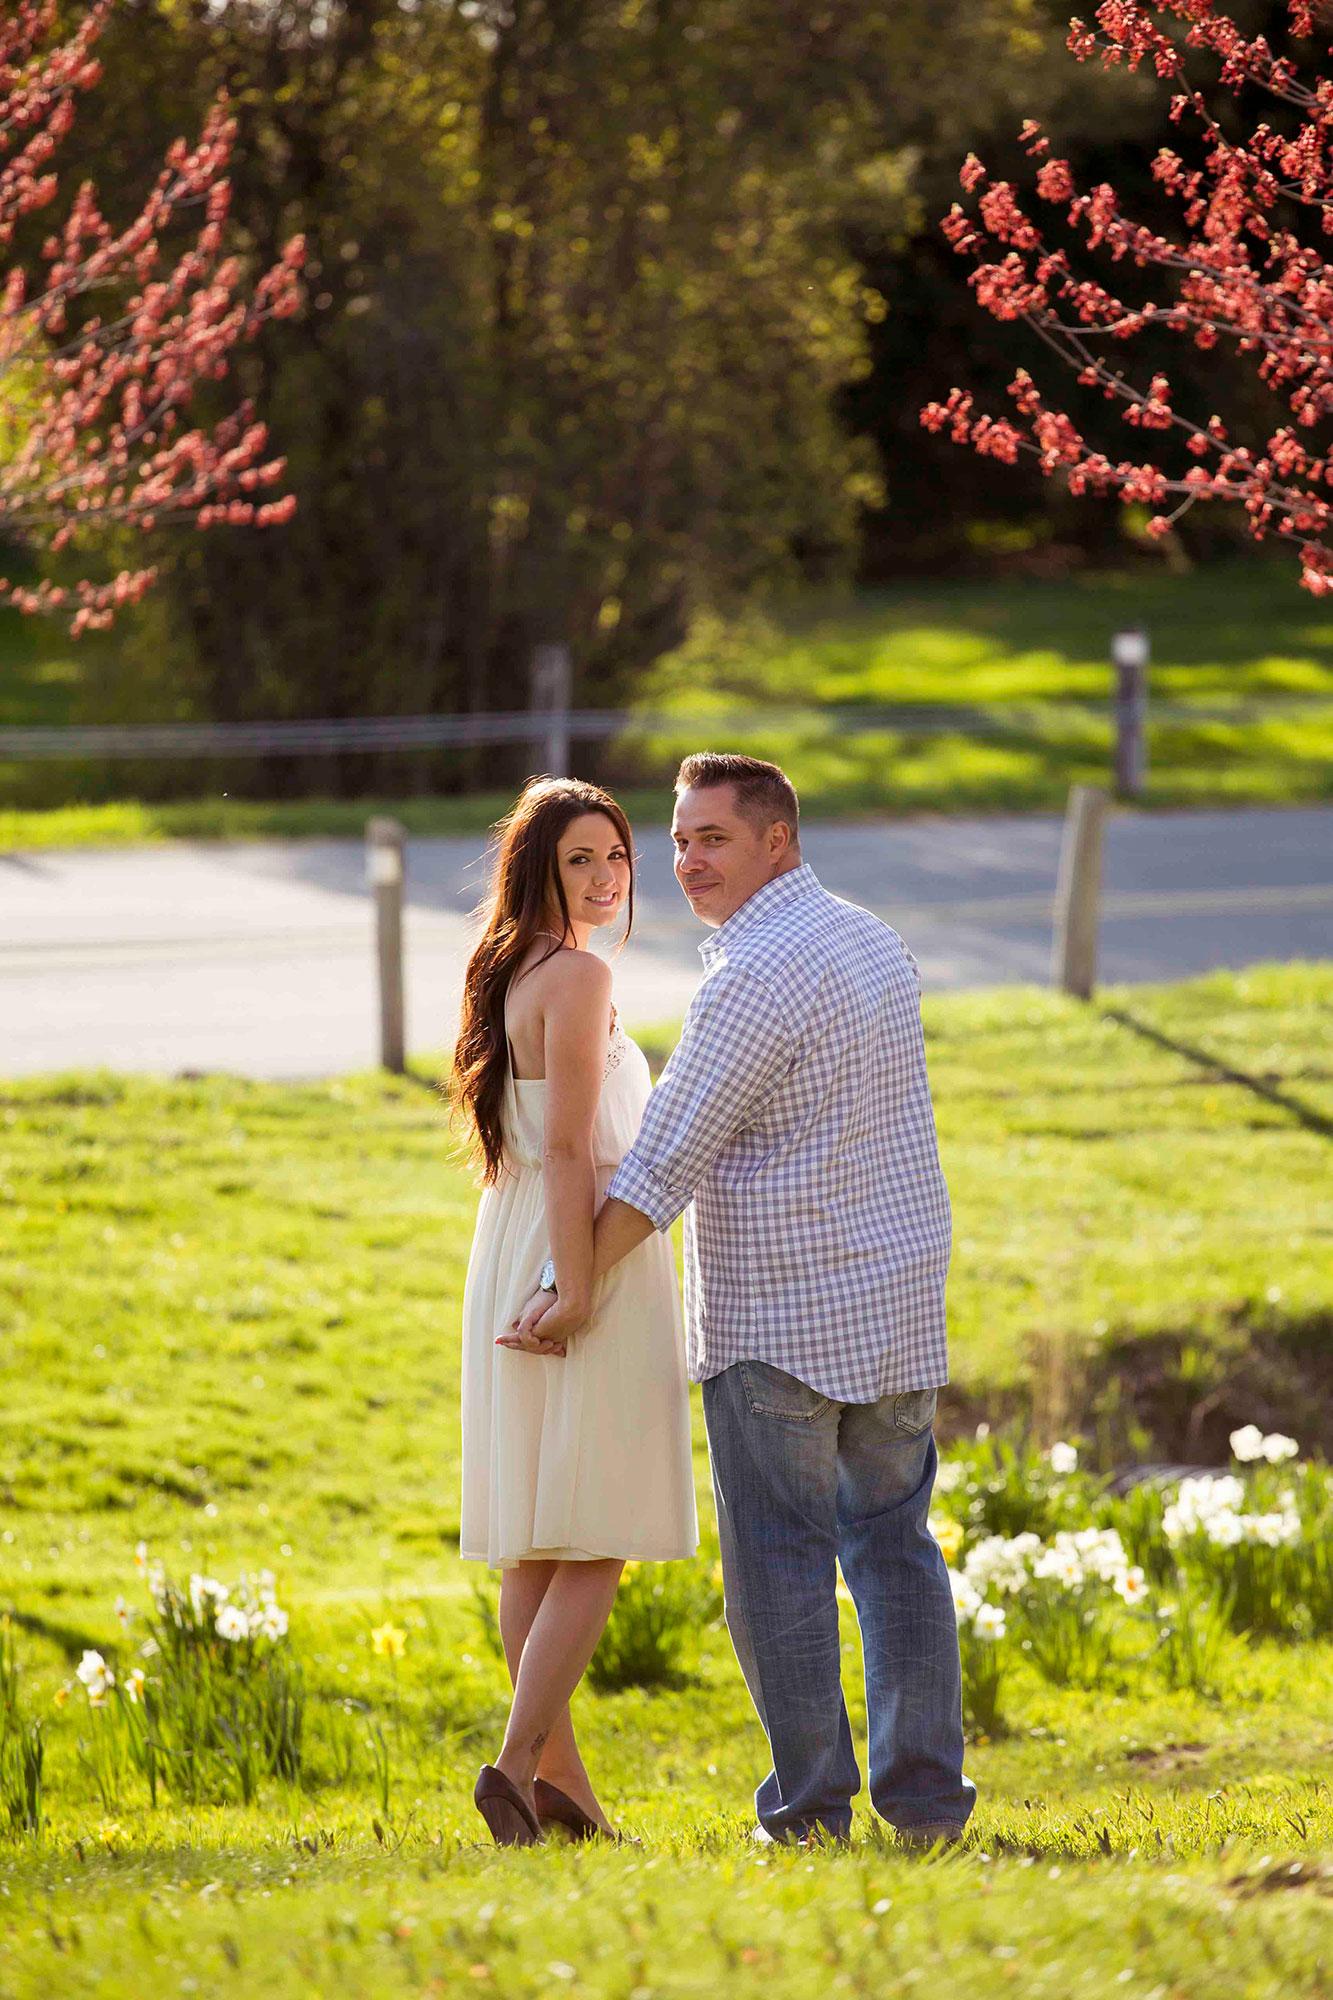 Niagara-on-the-Lake-Engagement-Vineyard-Bride-Photo-By-Gemini-Photography-026.jpg